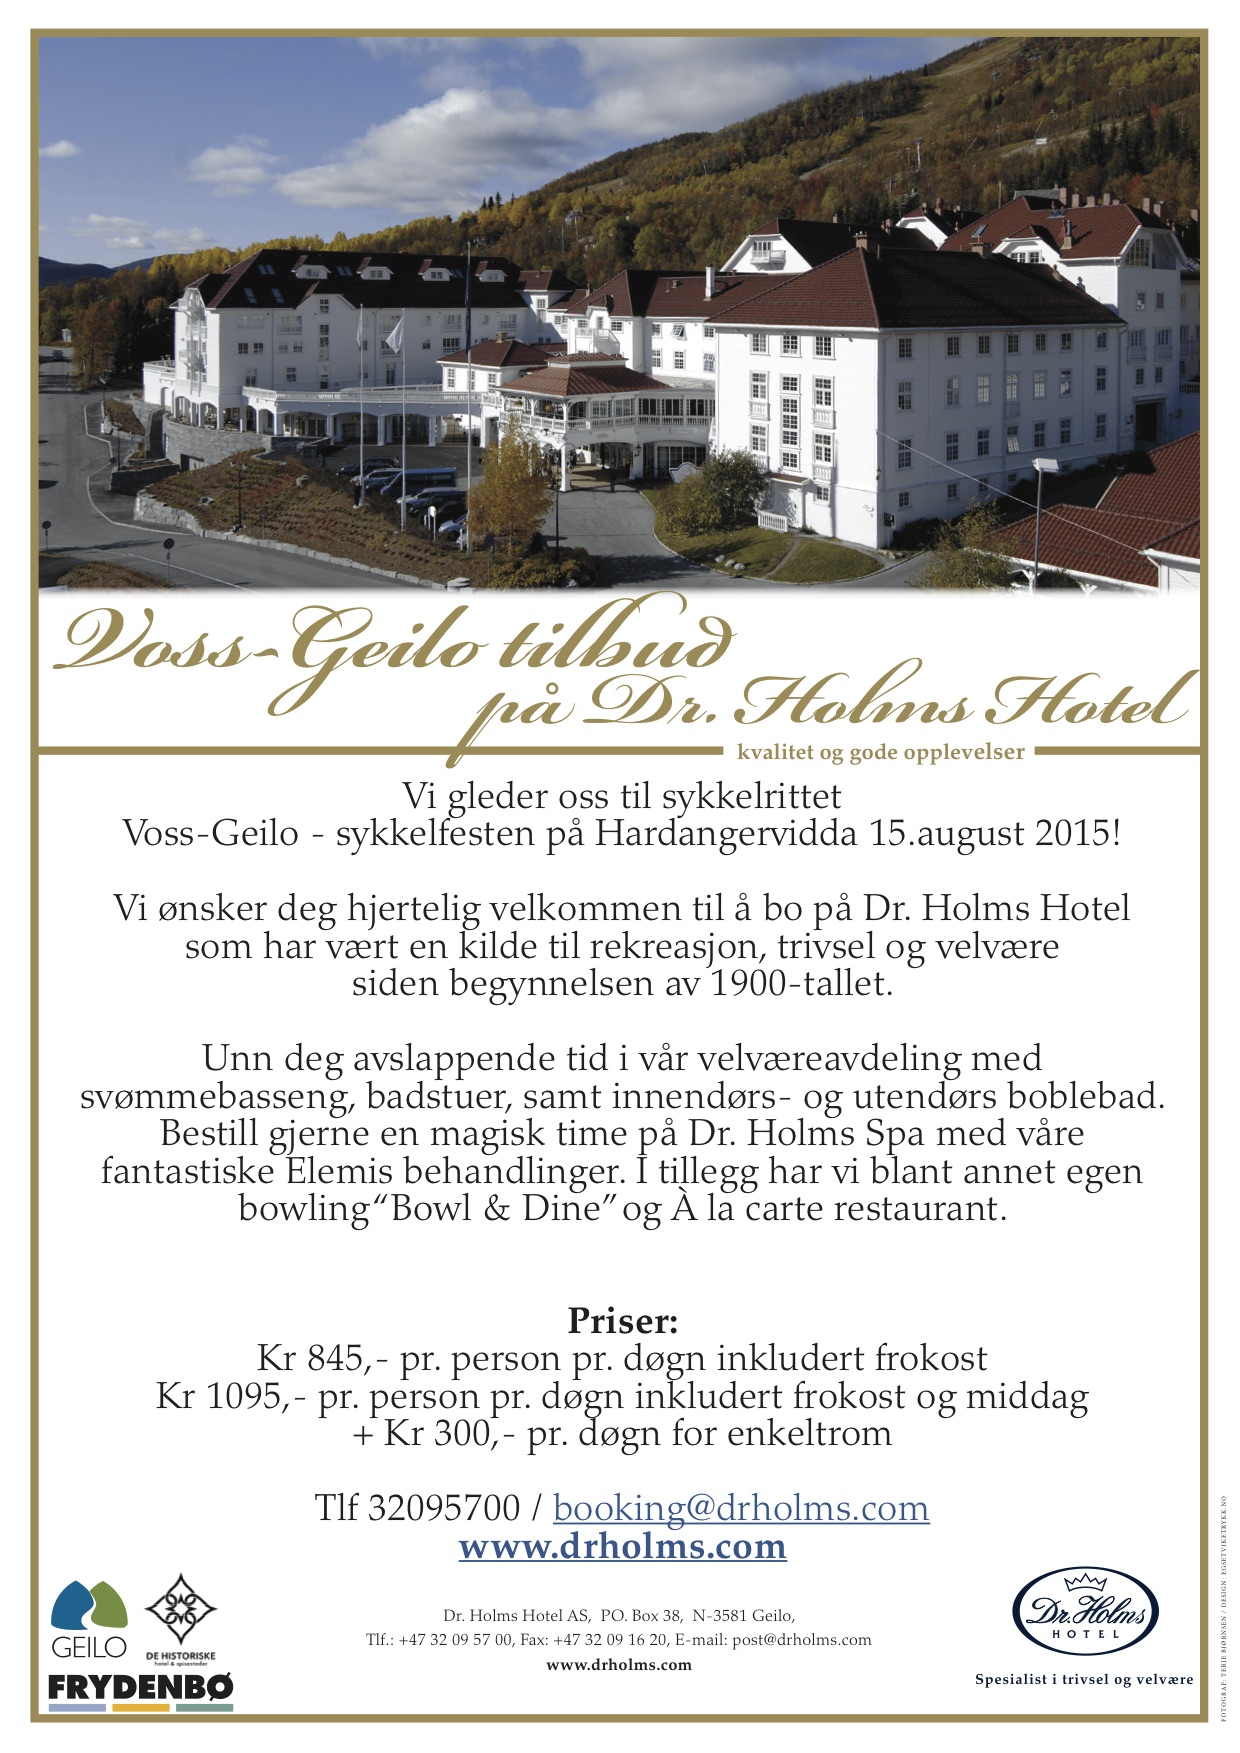 Overnattingstilbud sykkelrittet Voss - Geilo på Dr. Holms Hotel